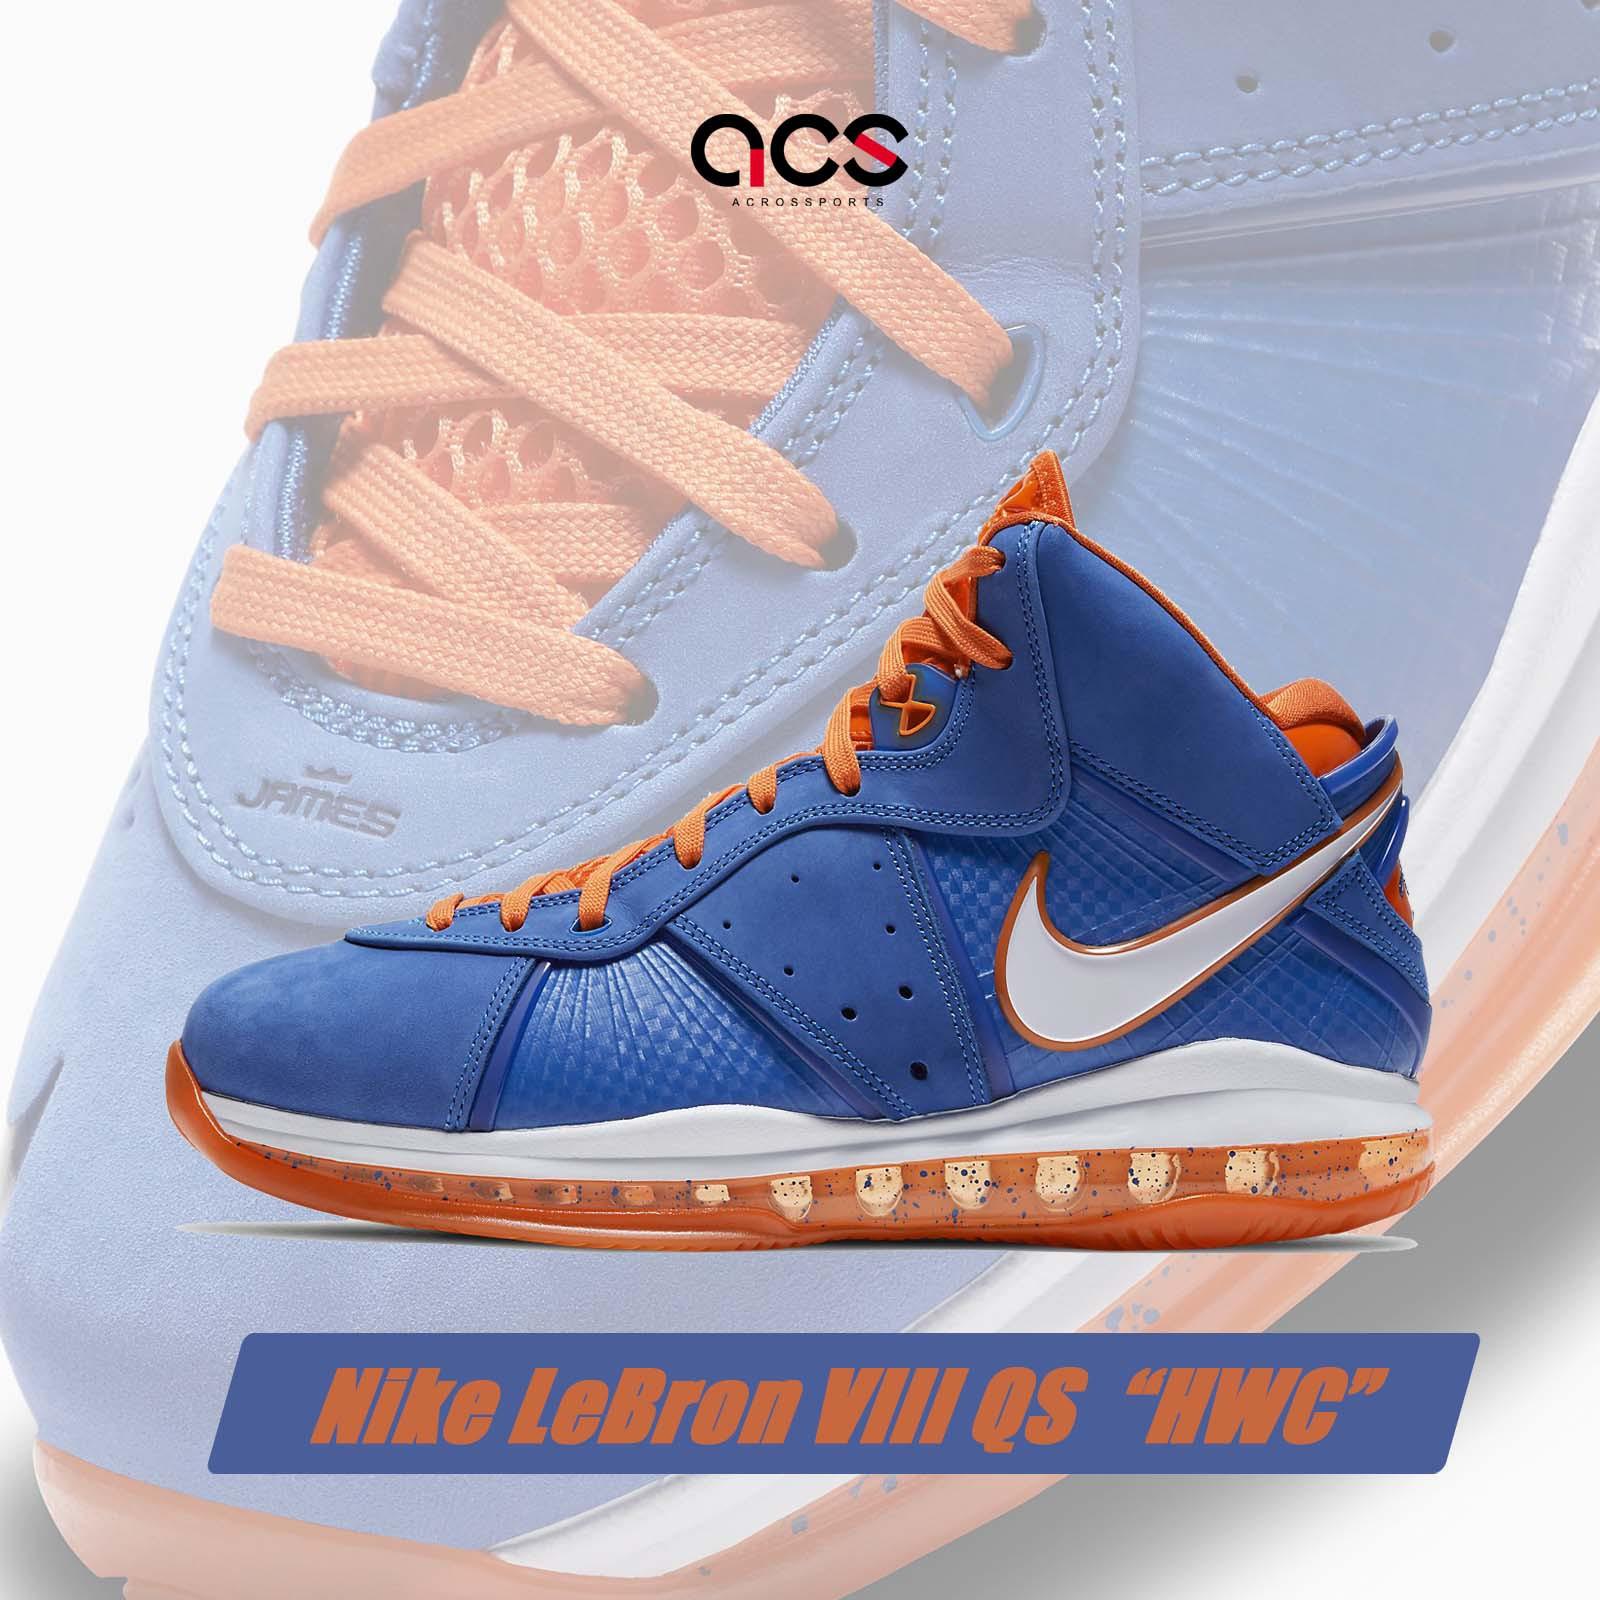 Nike 籃球鞋 Lebron VIII QS 藍 橘 詹皇 8代 復刻 HWC 男鞋 【ACS】 CV1750-400